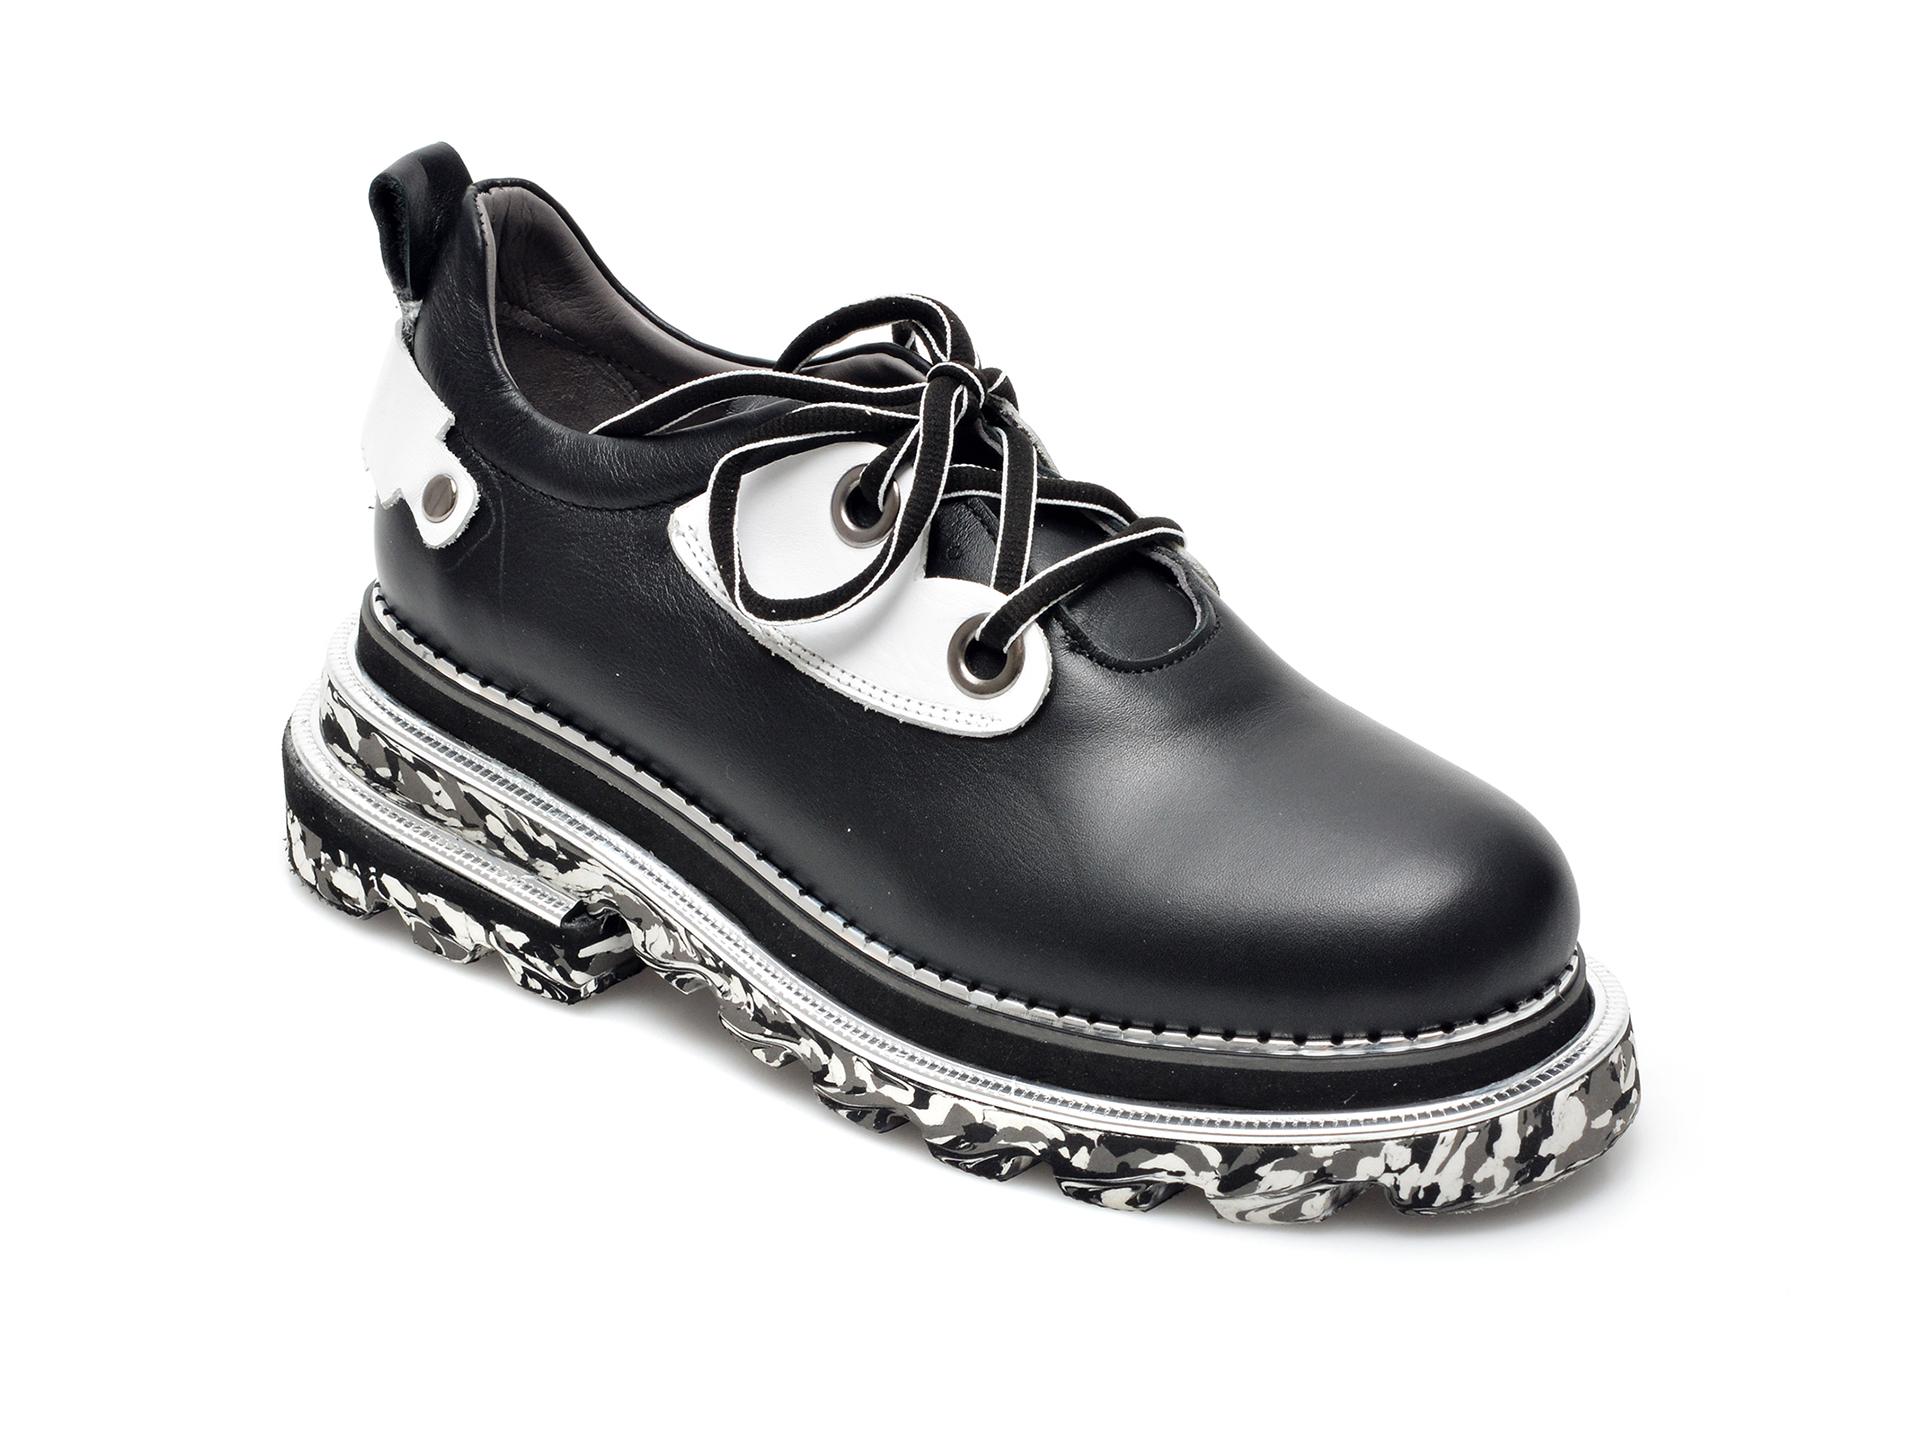 Pantofi EPICA negri, 297556, din piele naturala